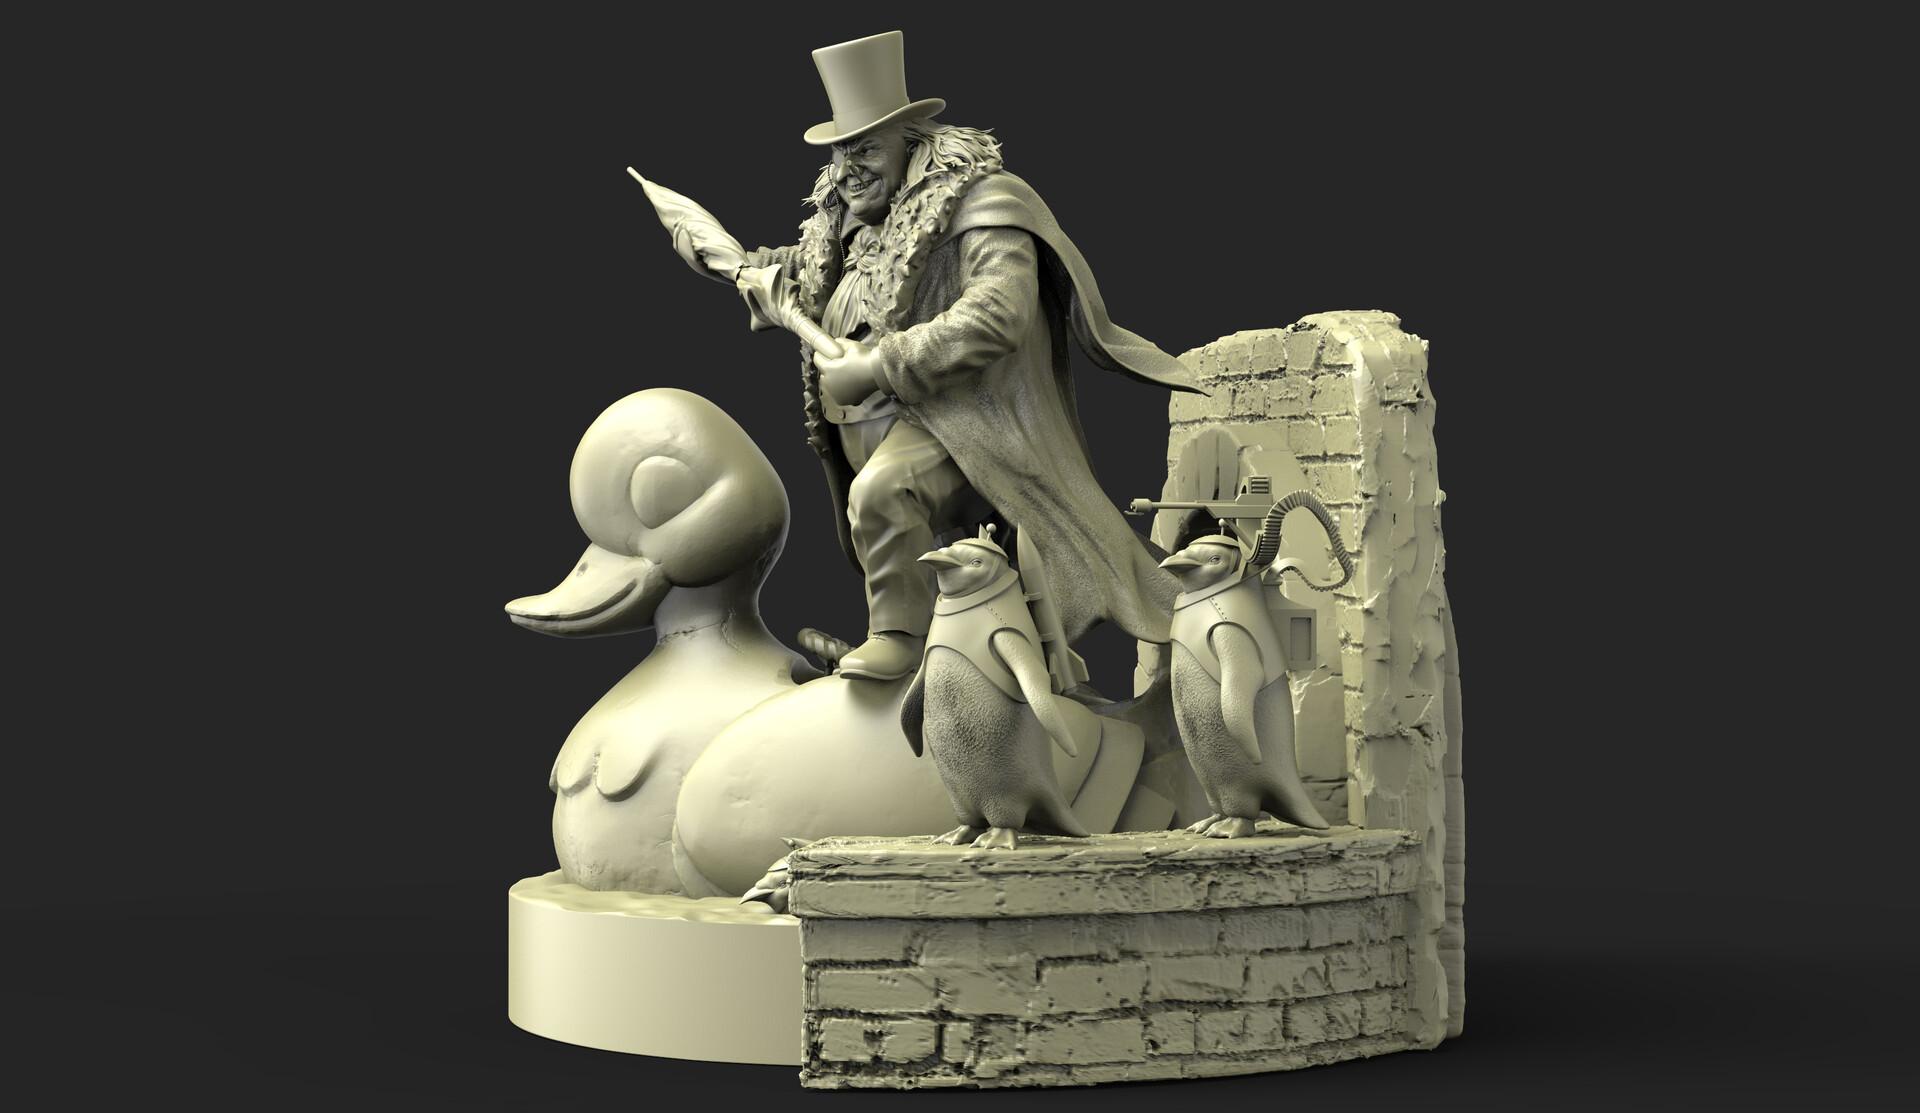 Andre ferwerda penguin 09